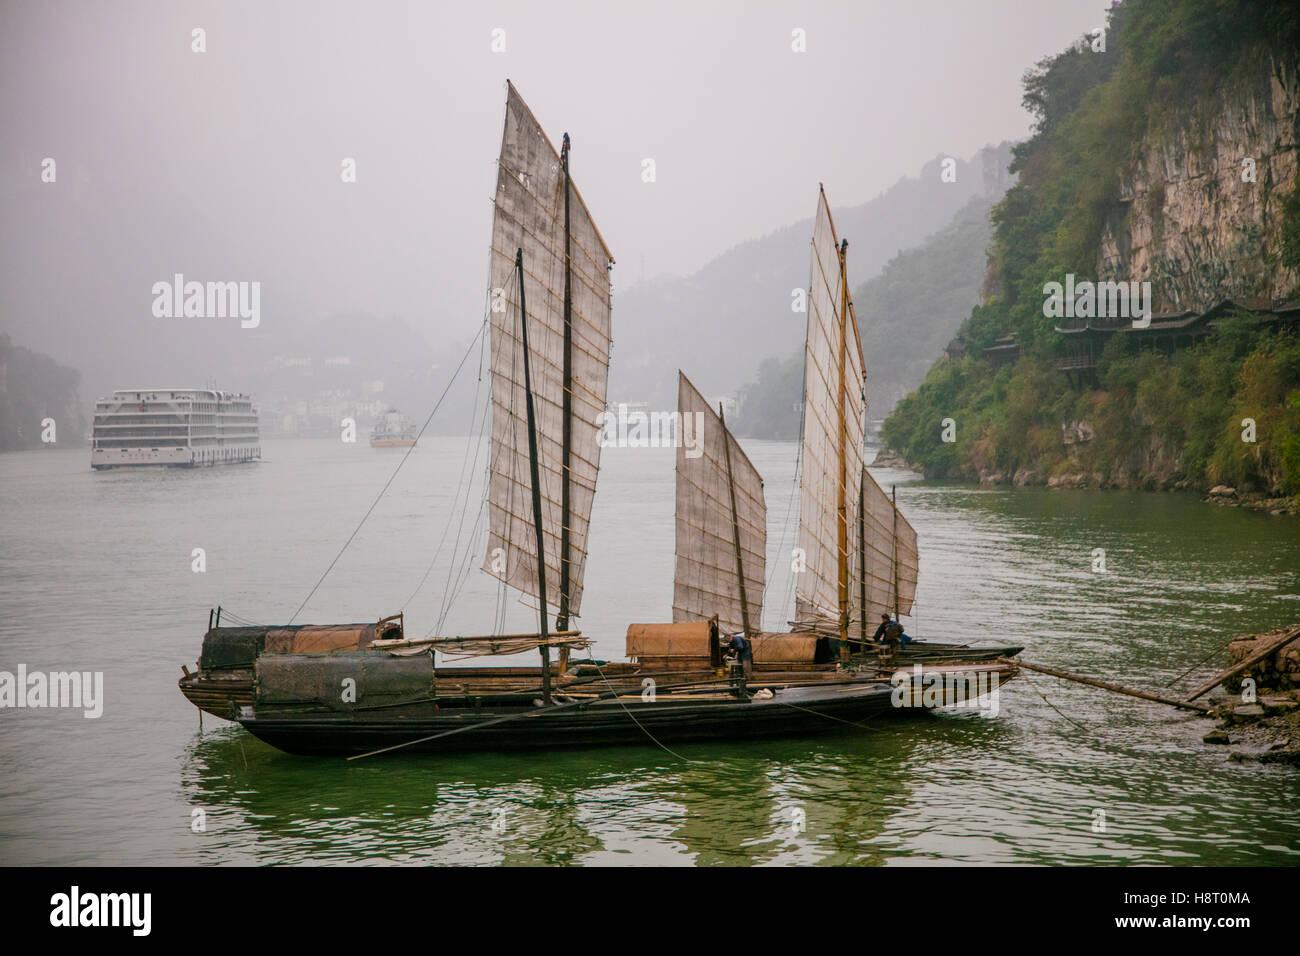 Shennong Stream Hubei Provinz Jangtse China Victoria Kreuzfahrten Asien 2016 Junk-Segelboot traditionelle Stockbild